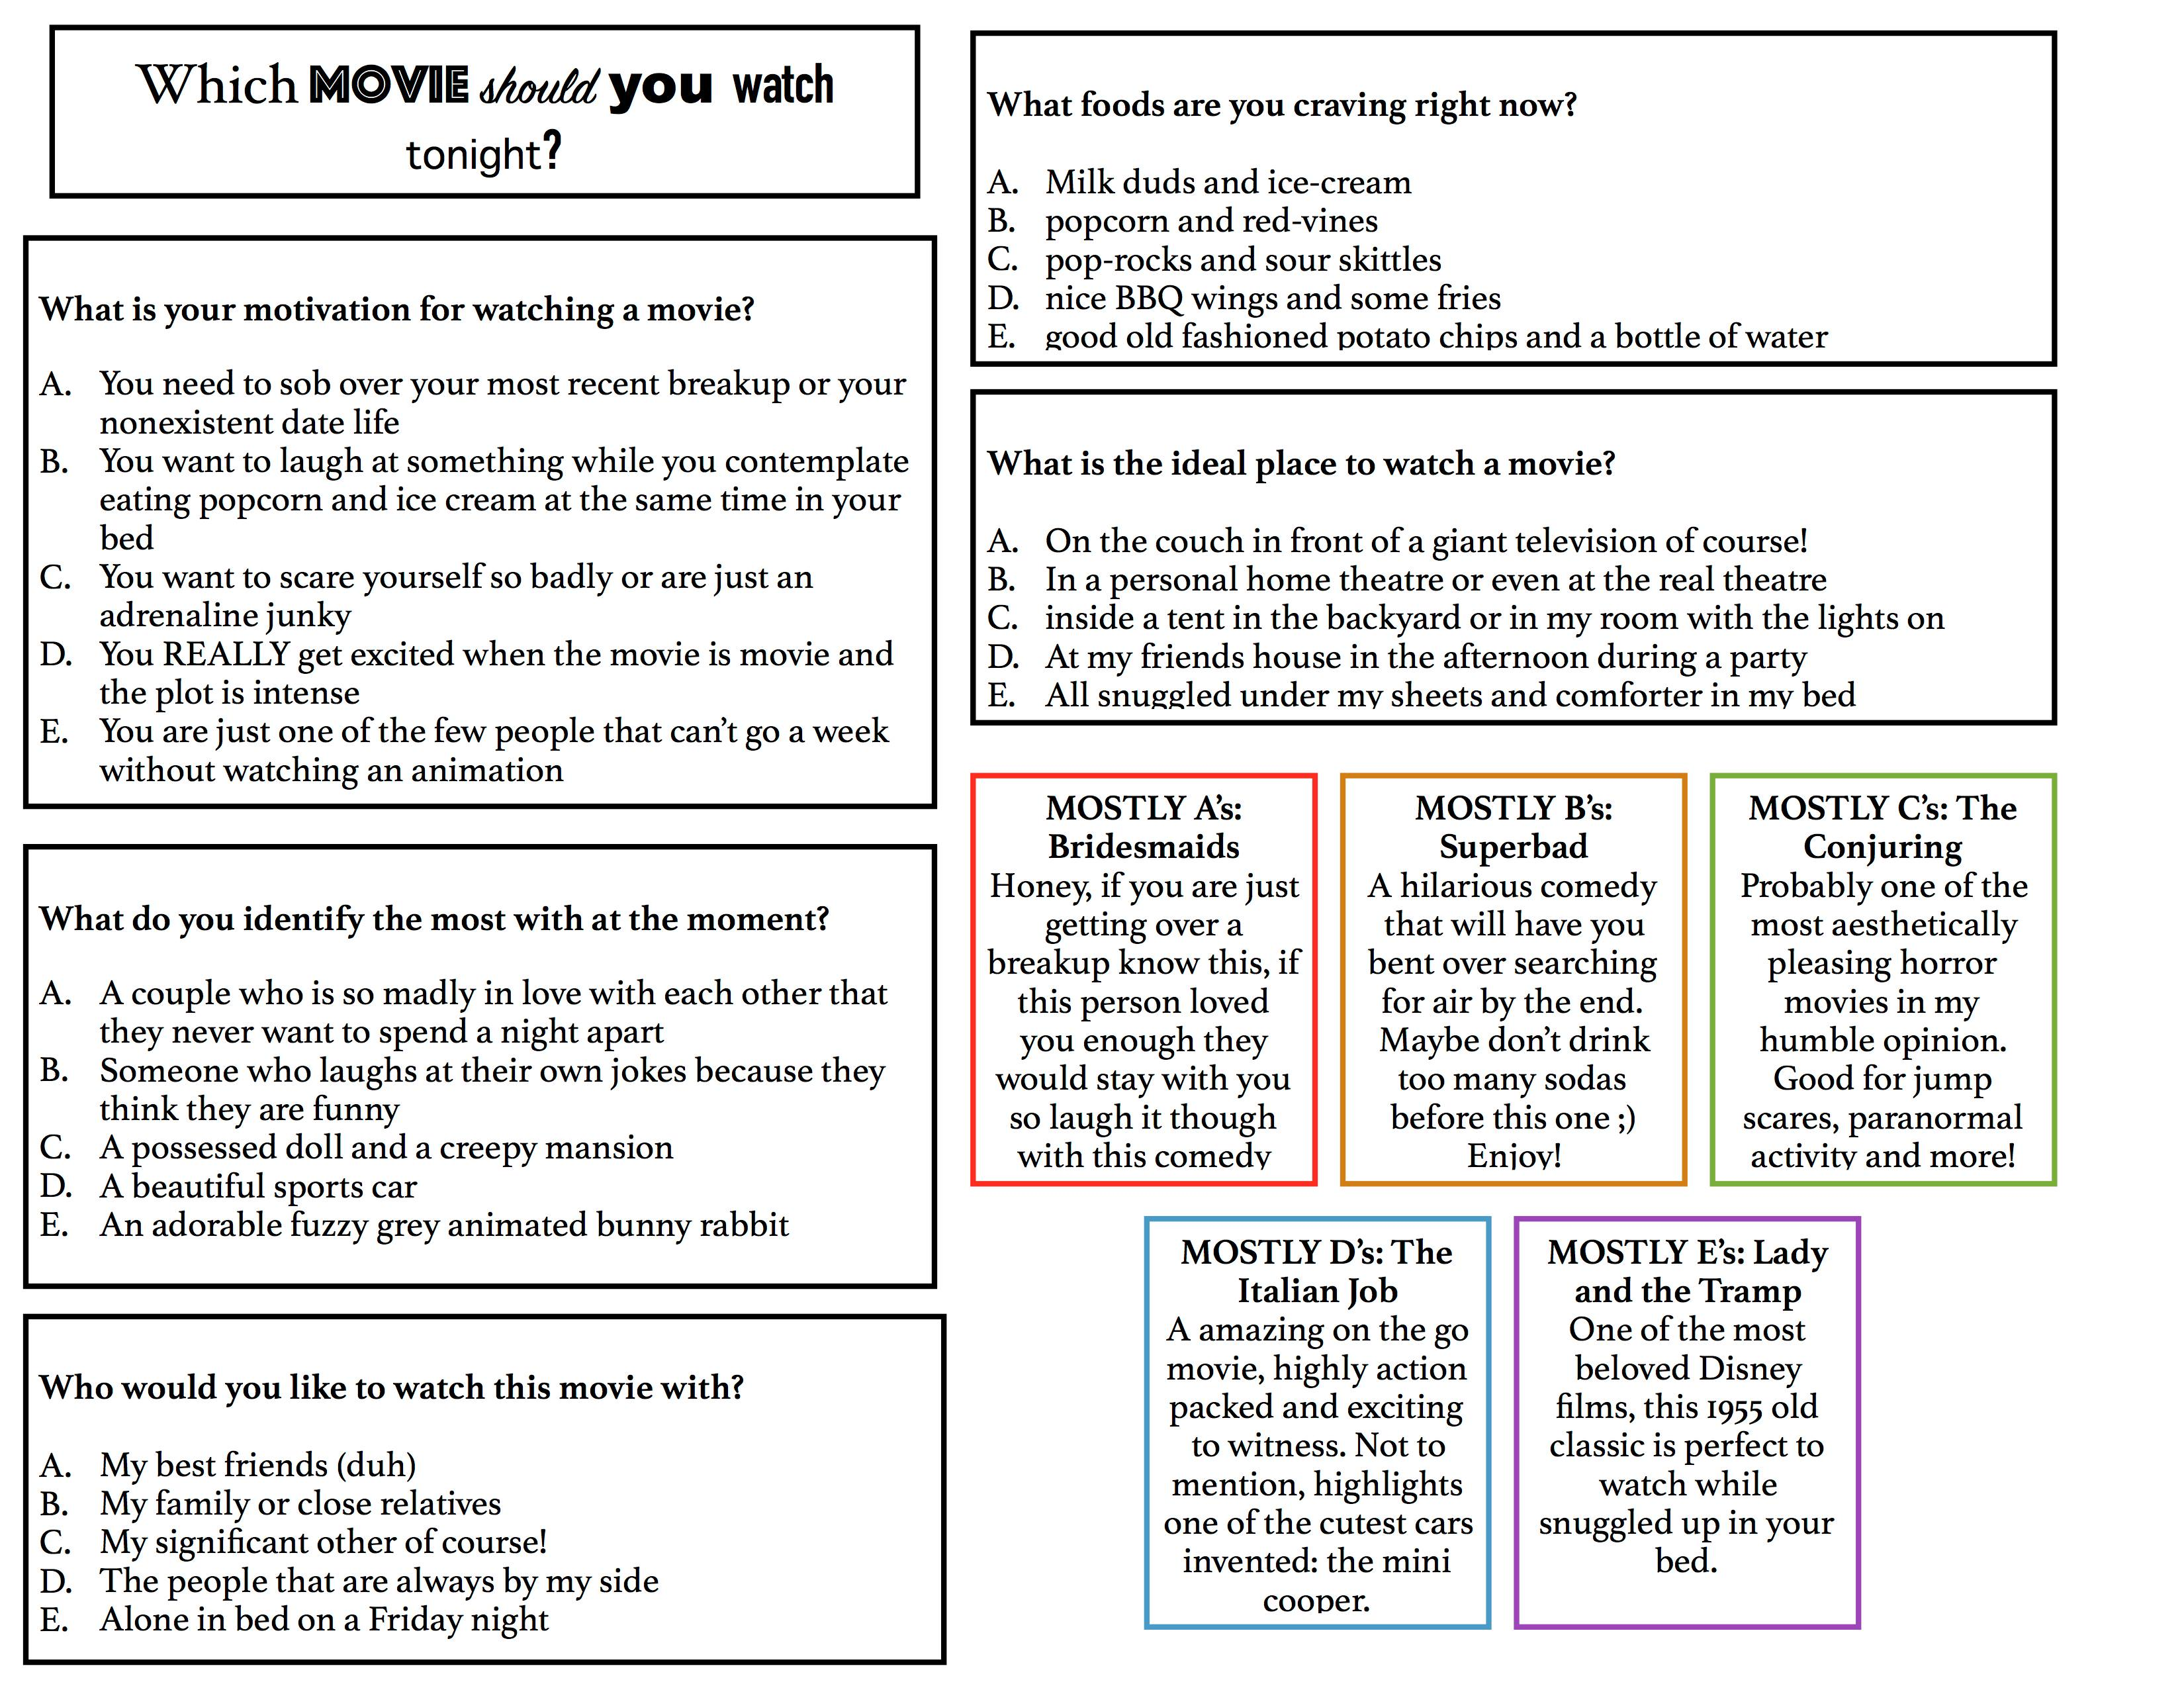 Pillbox Movie Quiz - The Tartan